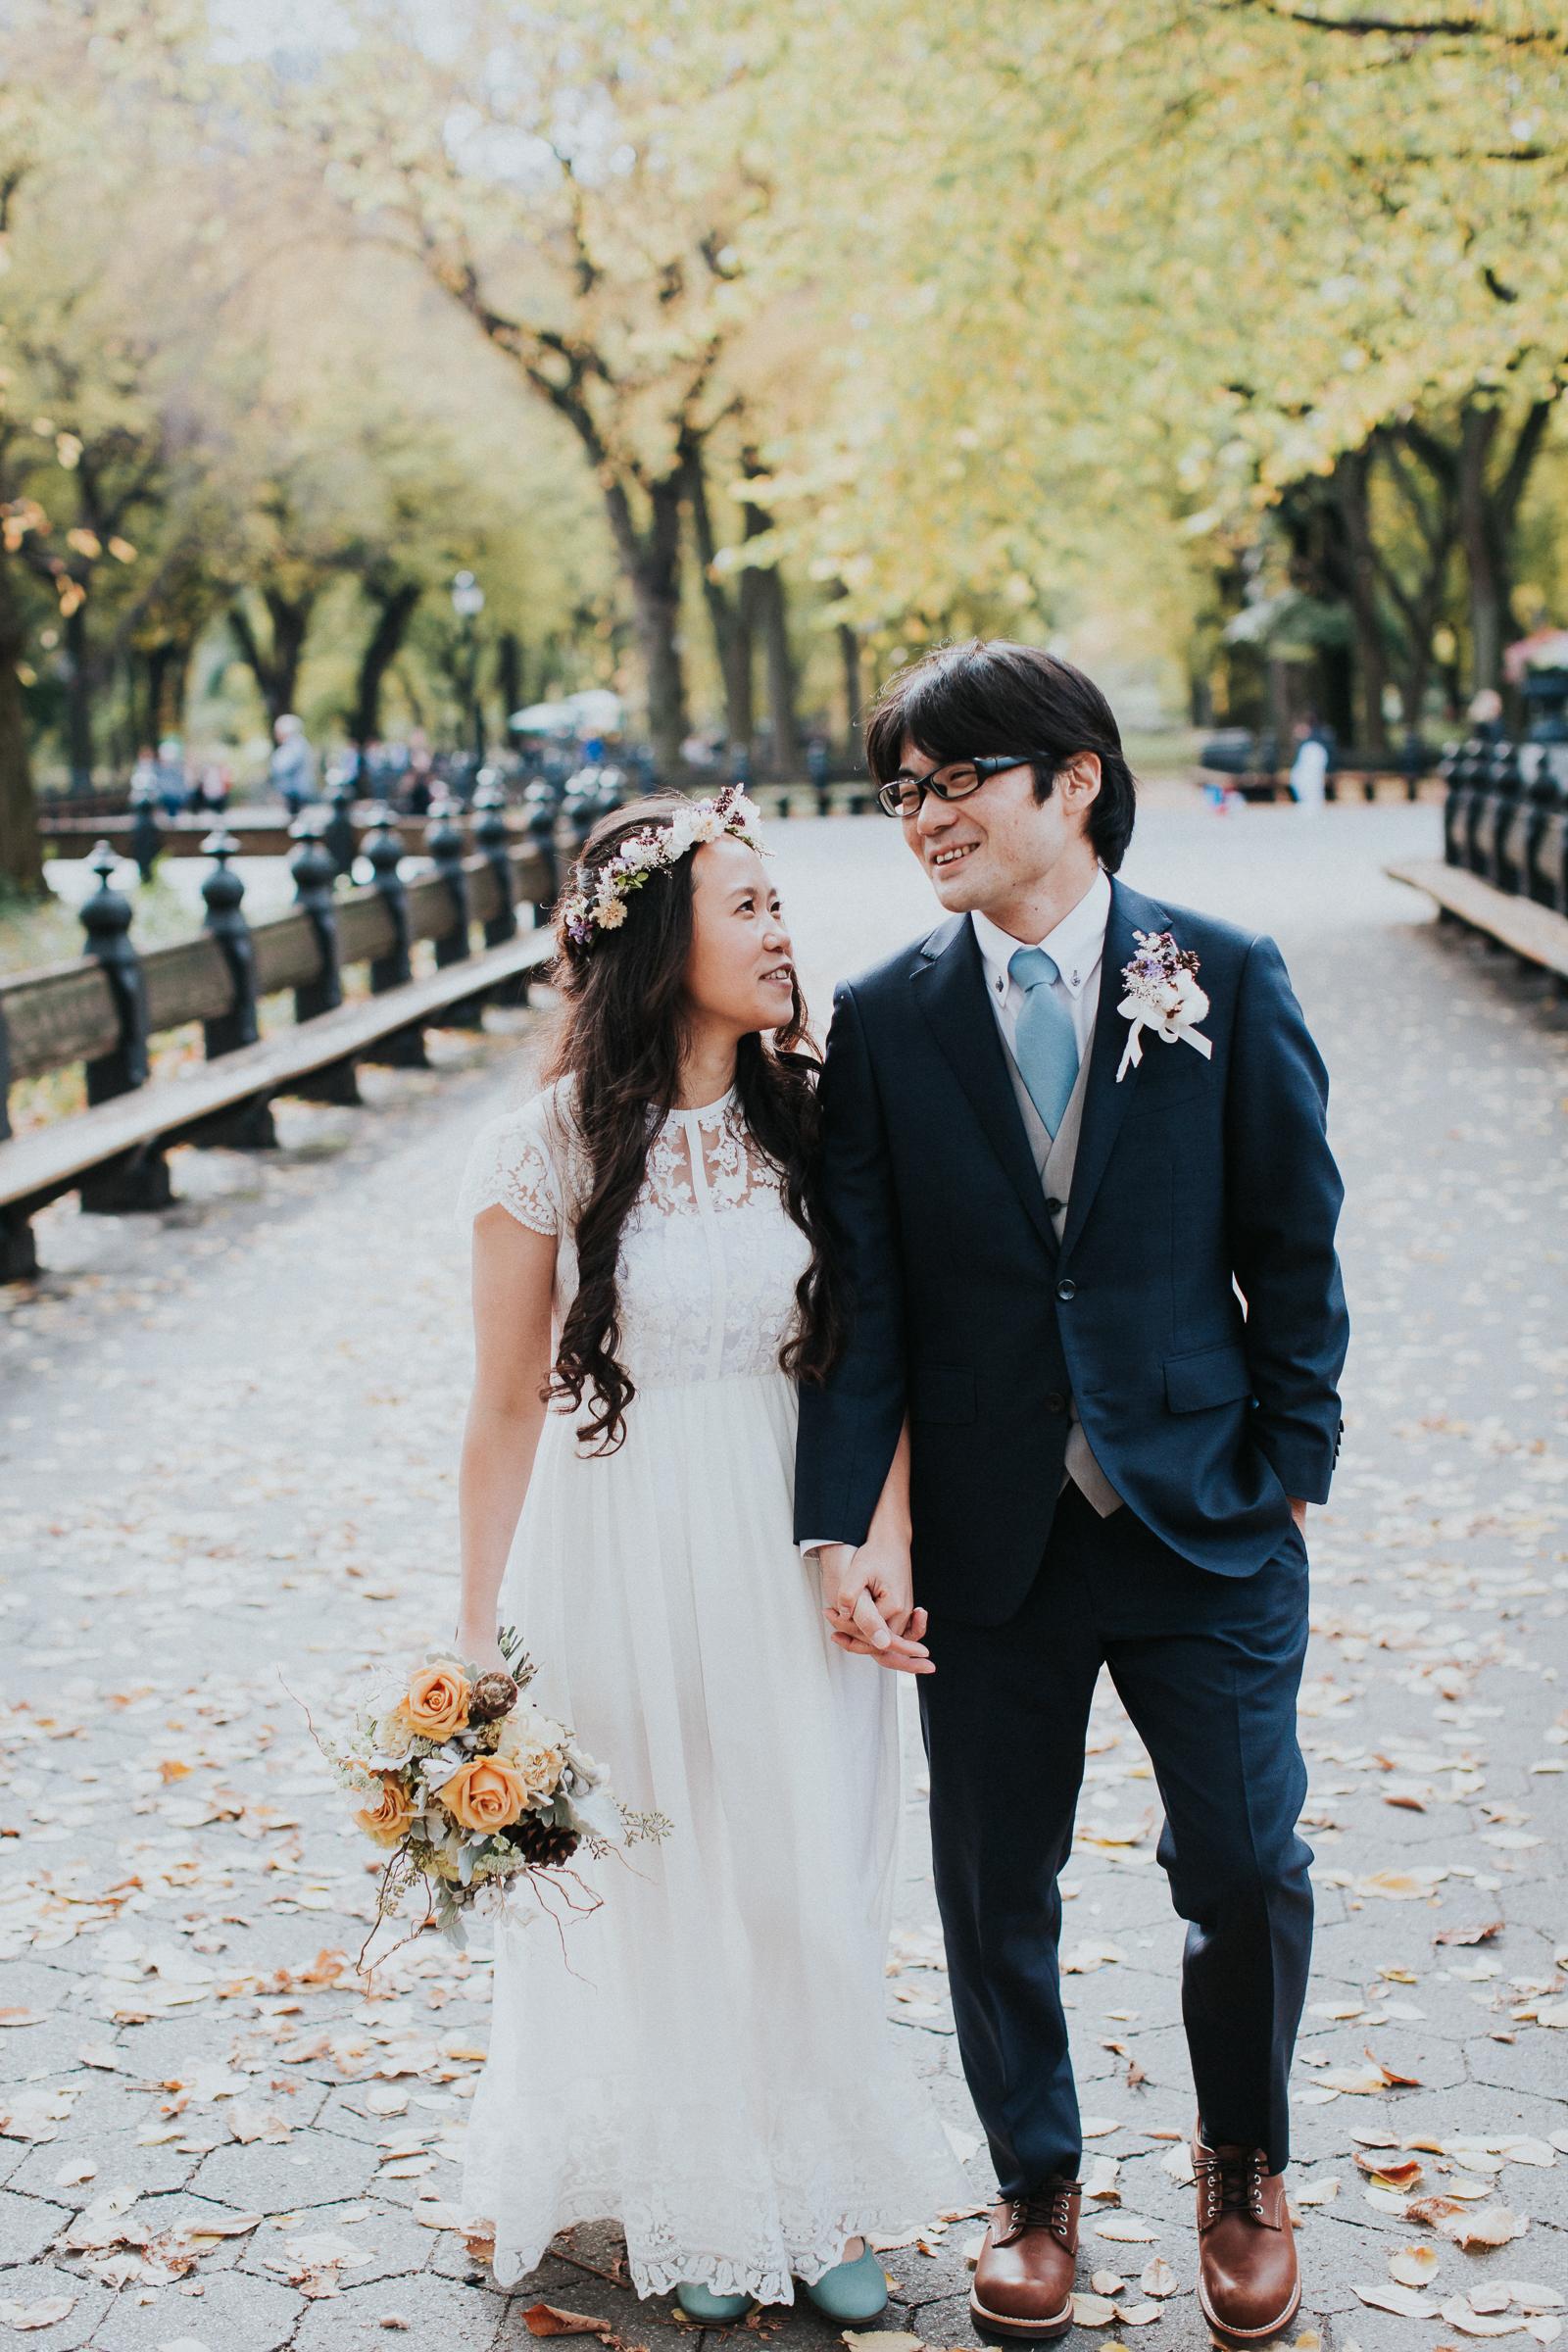 Central-Park-Brooklyn-Bridge-Dumbo-NYC-Documentary-Wedding-Photographer-46.jpg